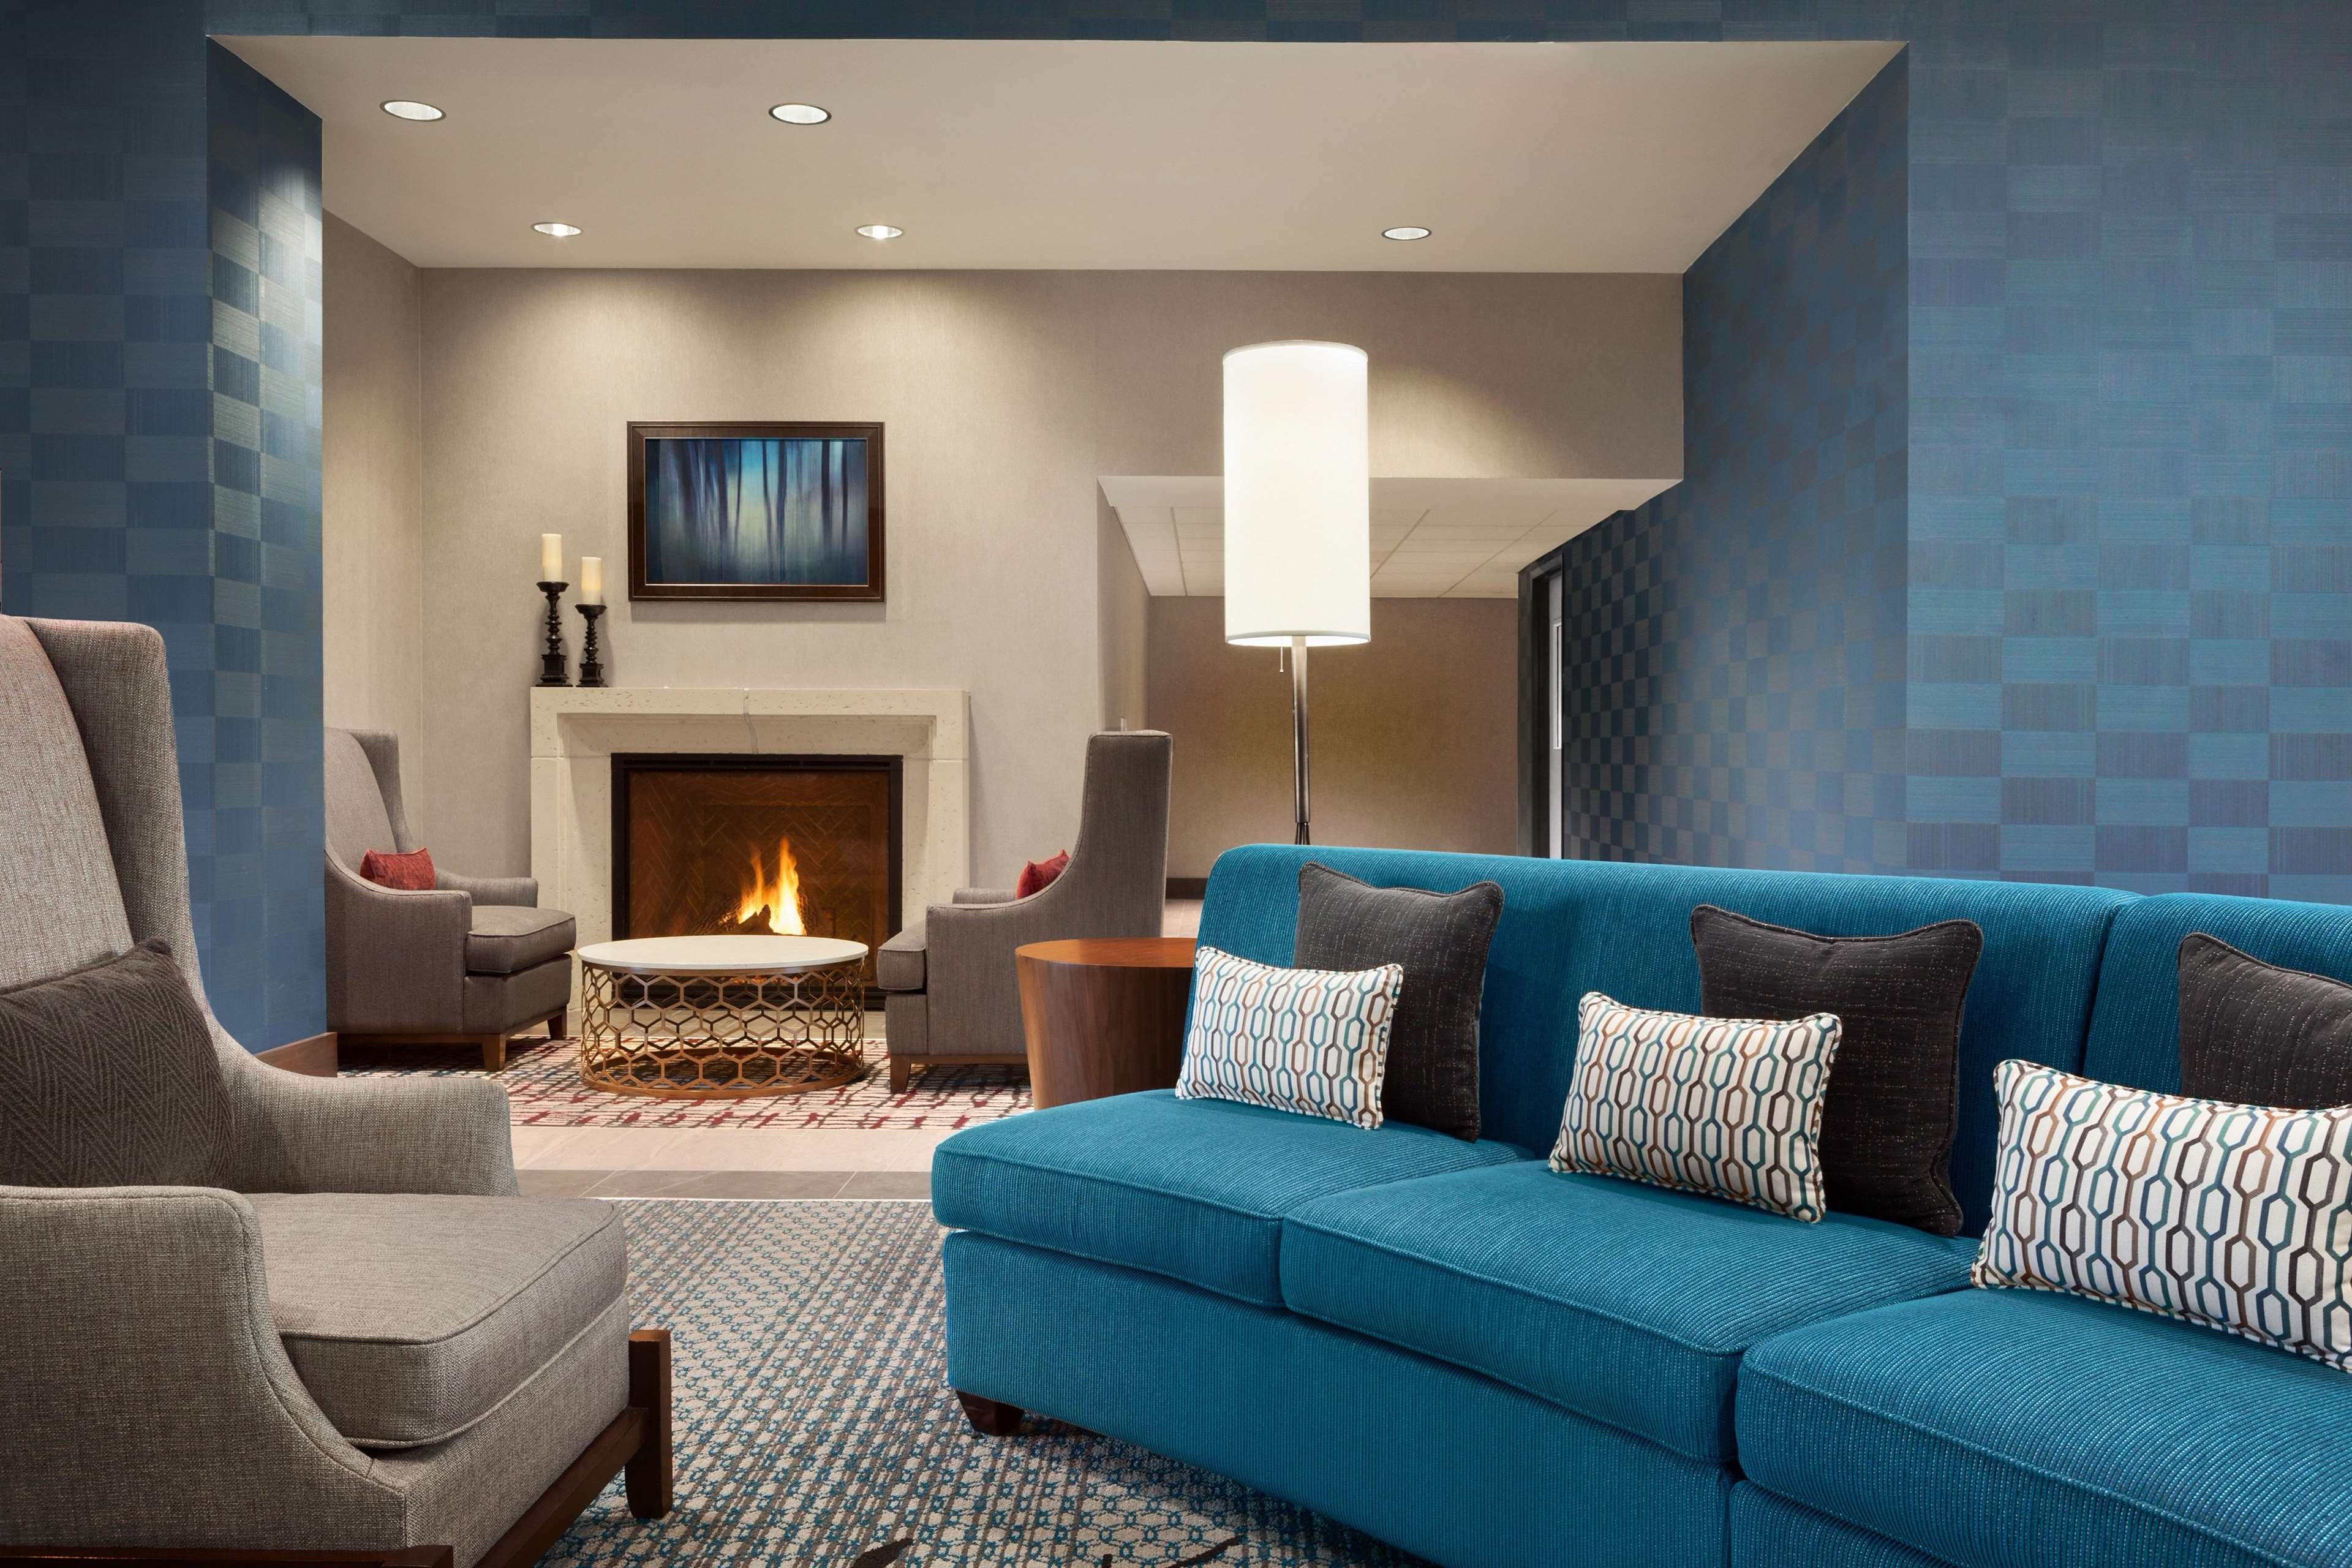 Homewood Suites by Hilton Charlotte/SouthPark image 10